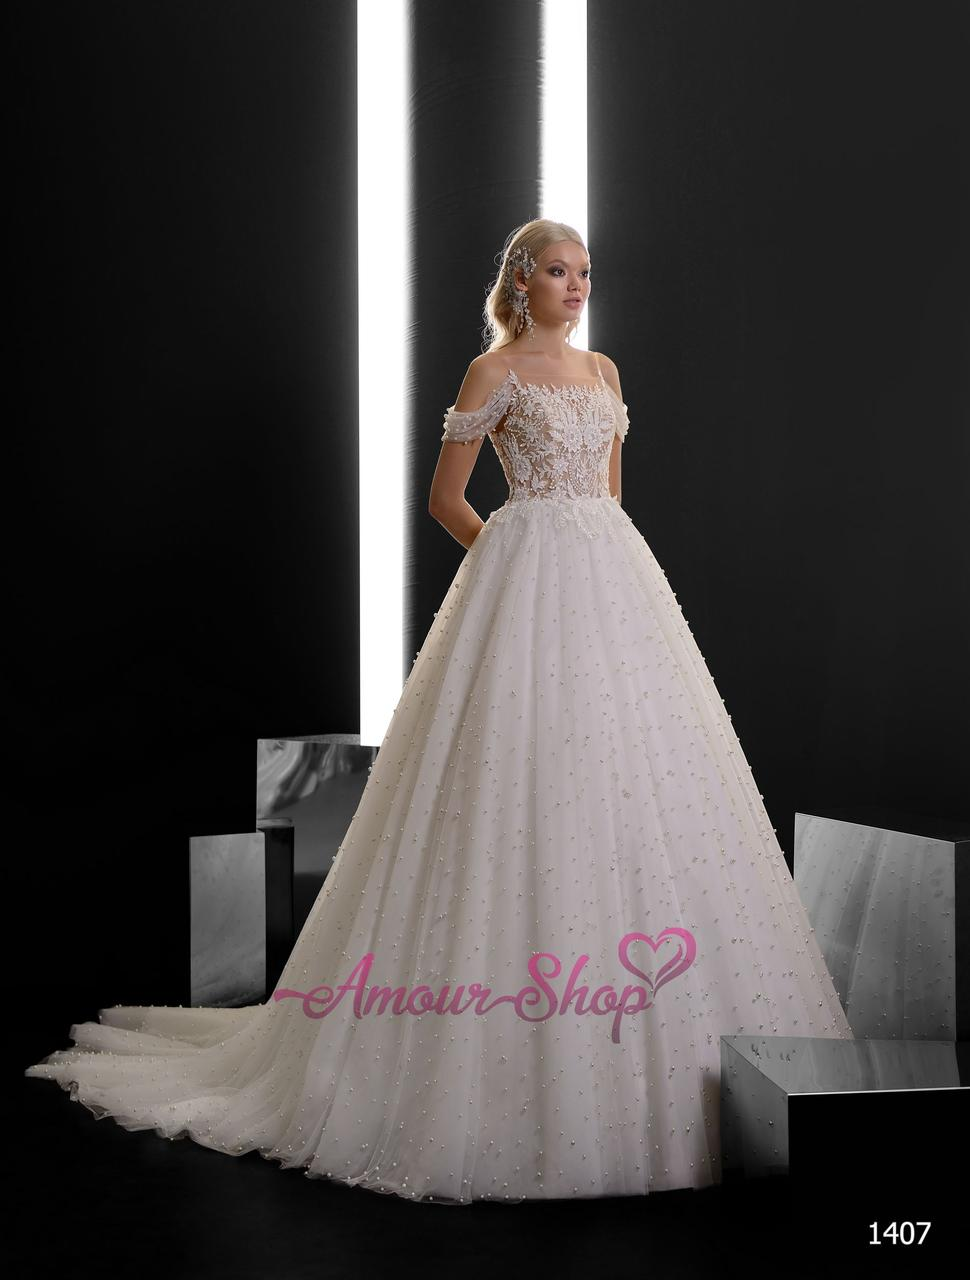 Пишне весільне плаття в жемчужинках з спущеными плічками